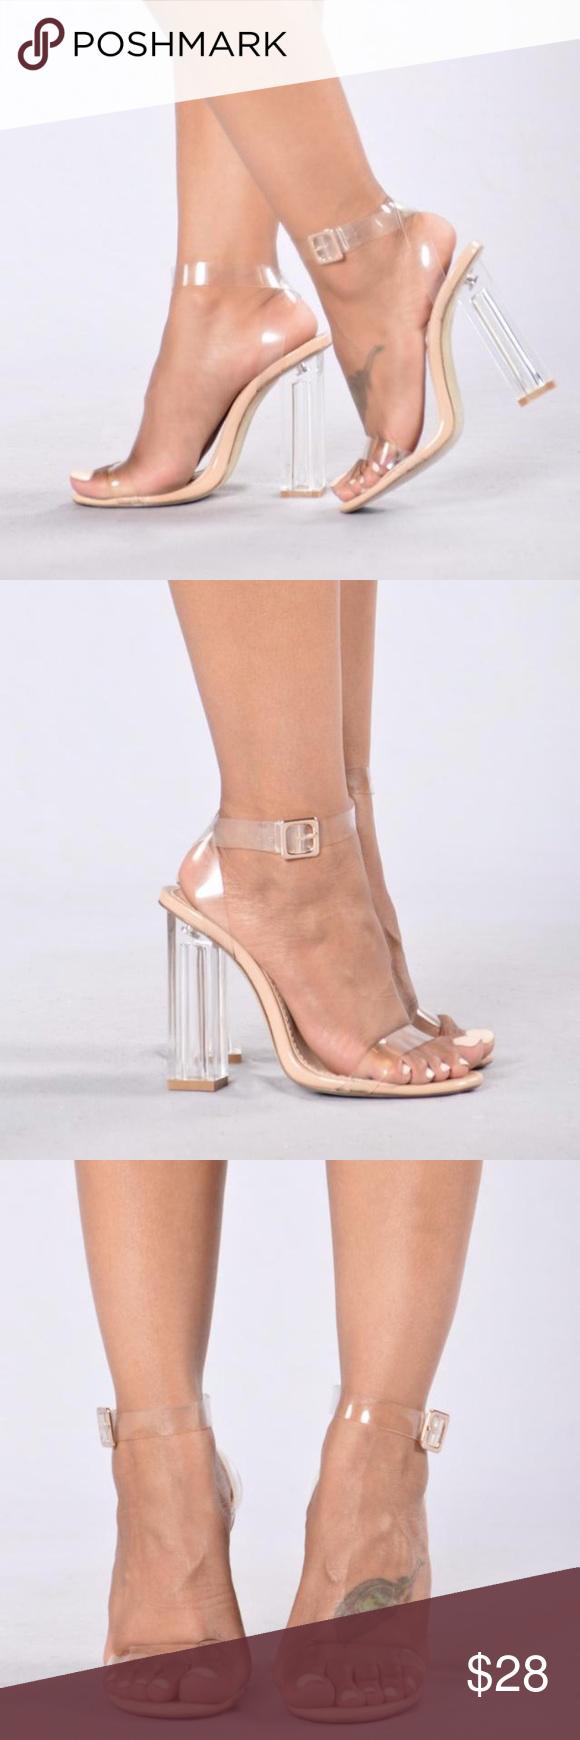 cbe96809ef8 Fashion Nova transparent heels size 6. brand new. fits like 5.5 ...